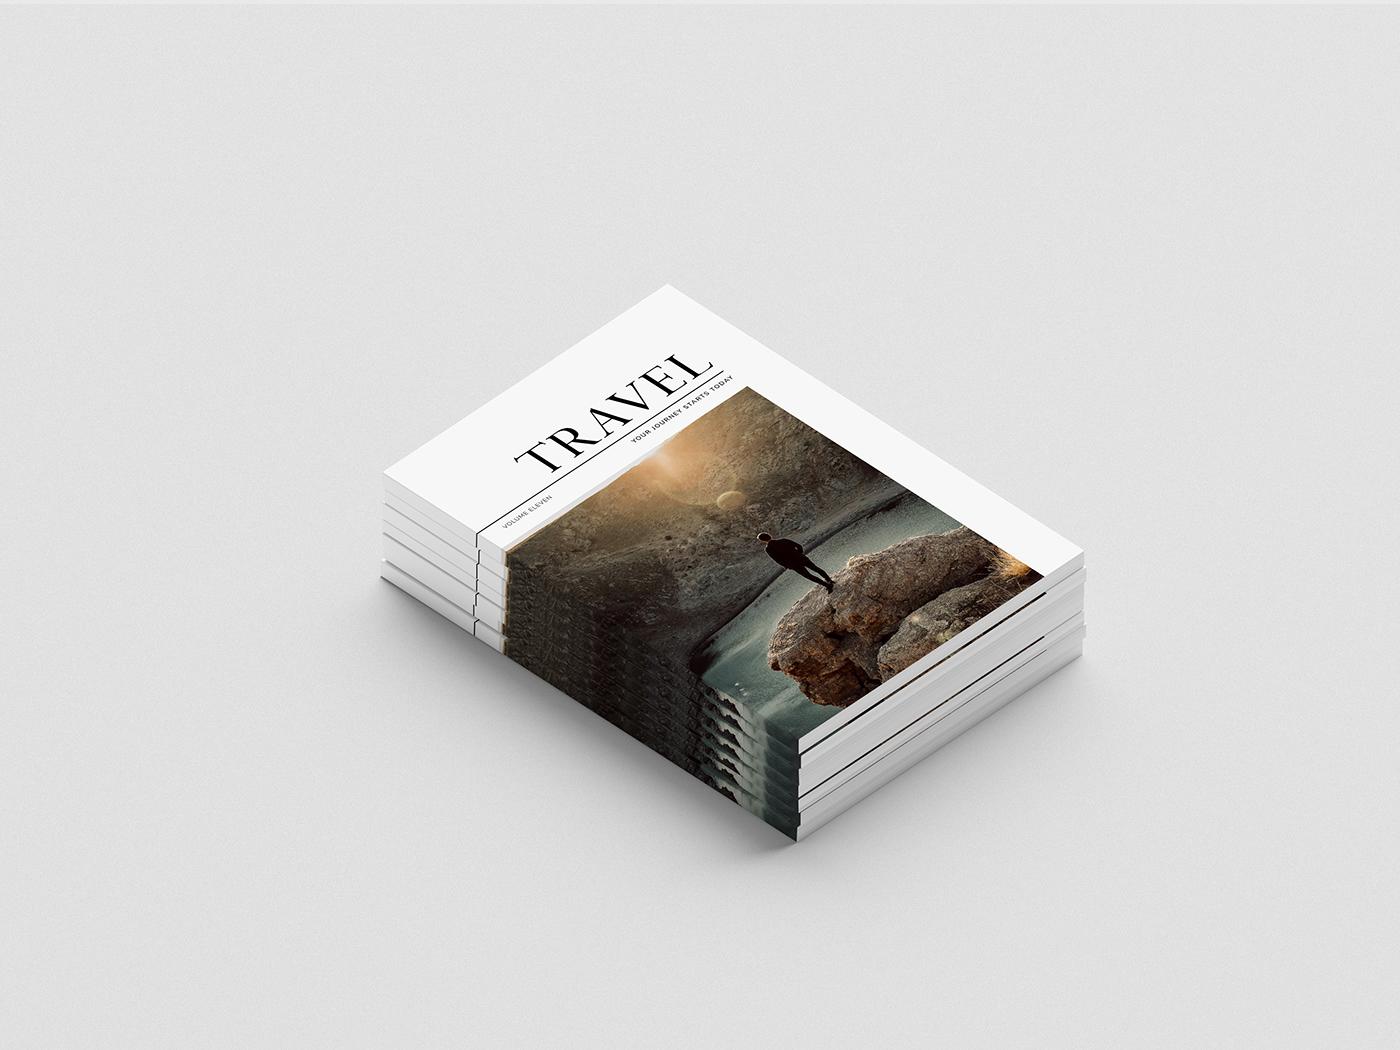 Image may contain: book and box